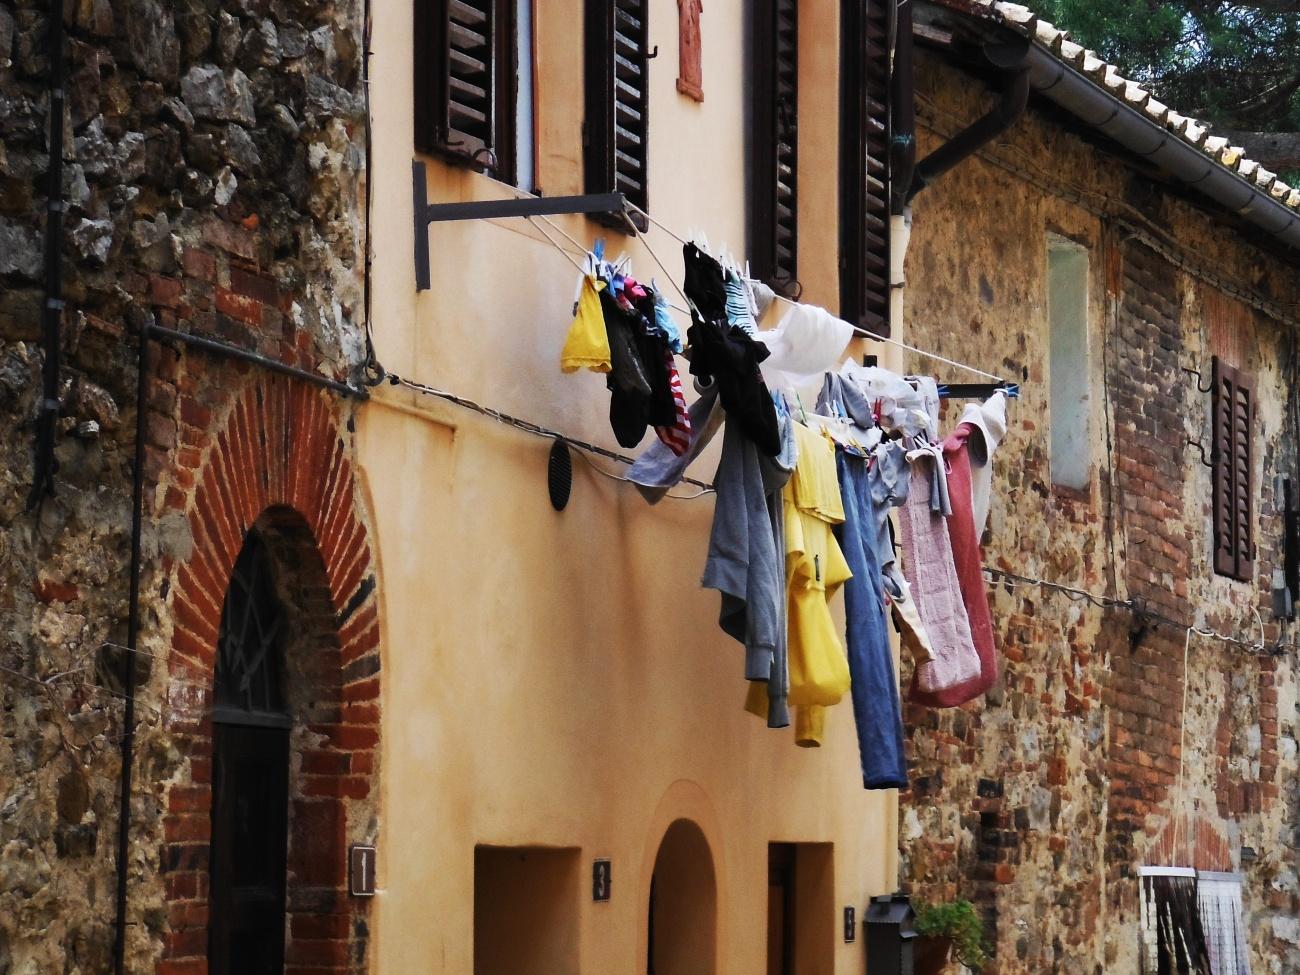 Streets of San Gusme Italy